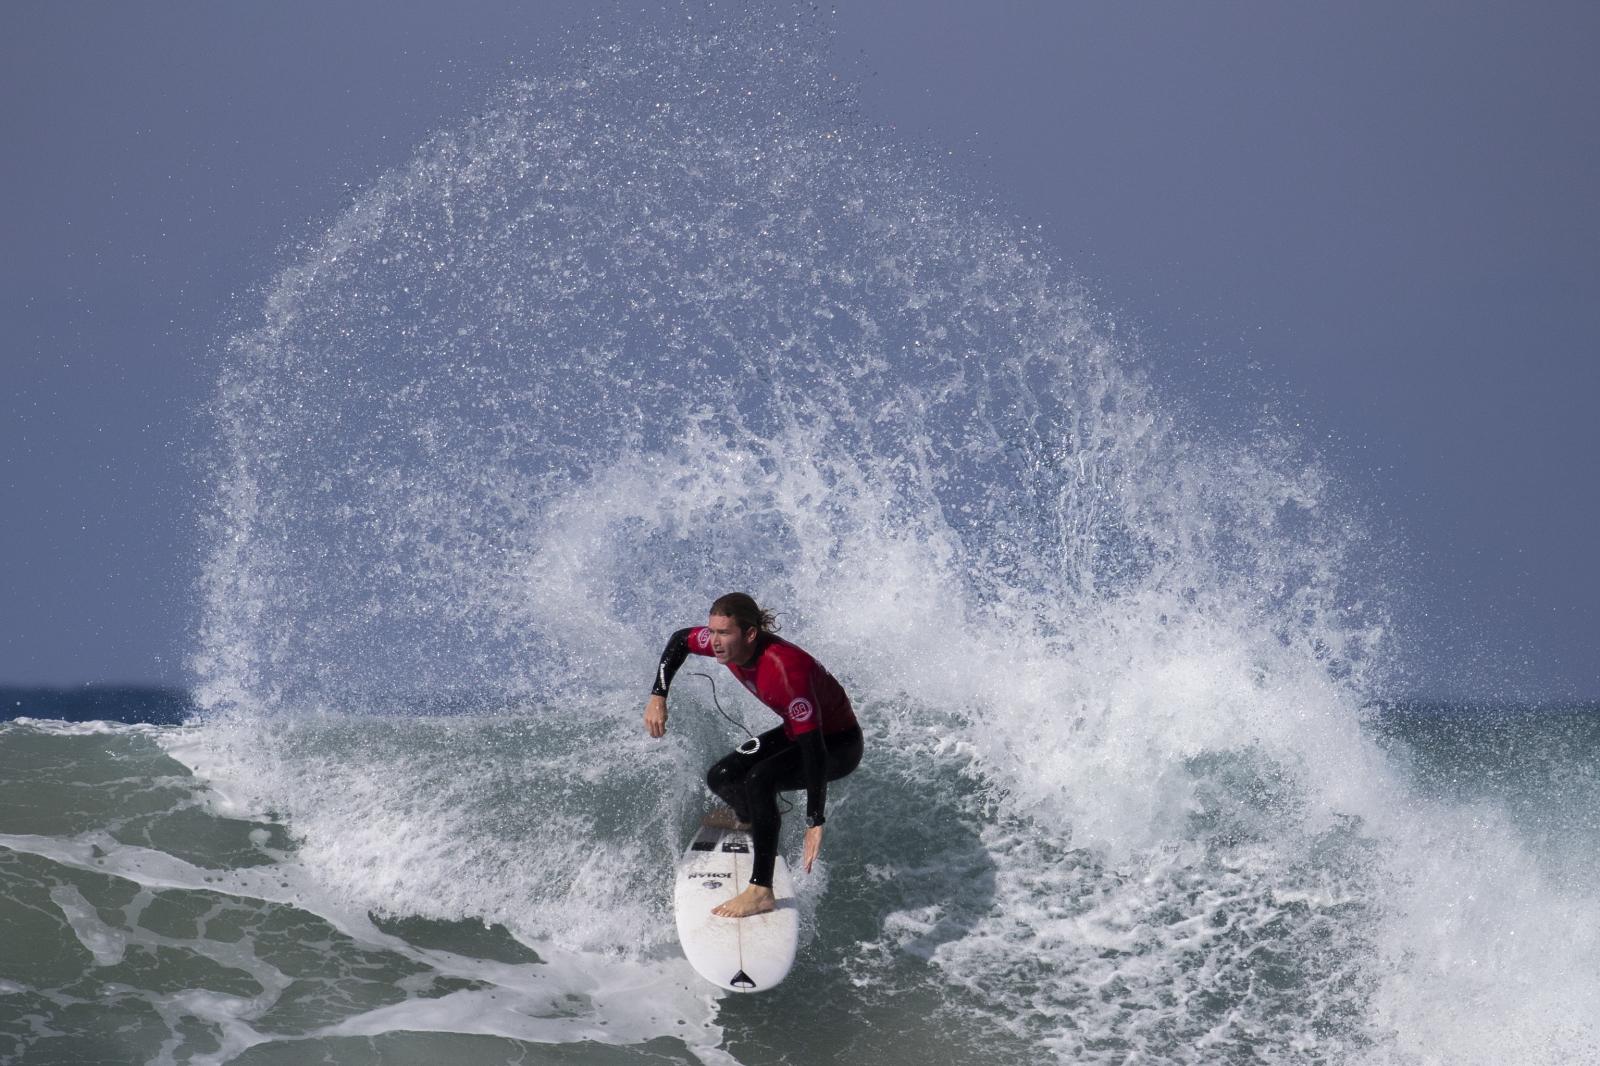 Surfing w Izraelu fot. EPA/JIM HOLLANDER